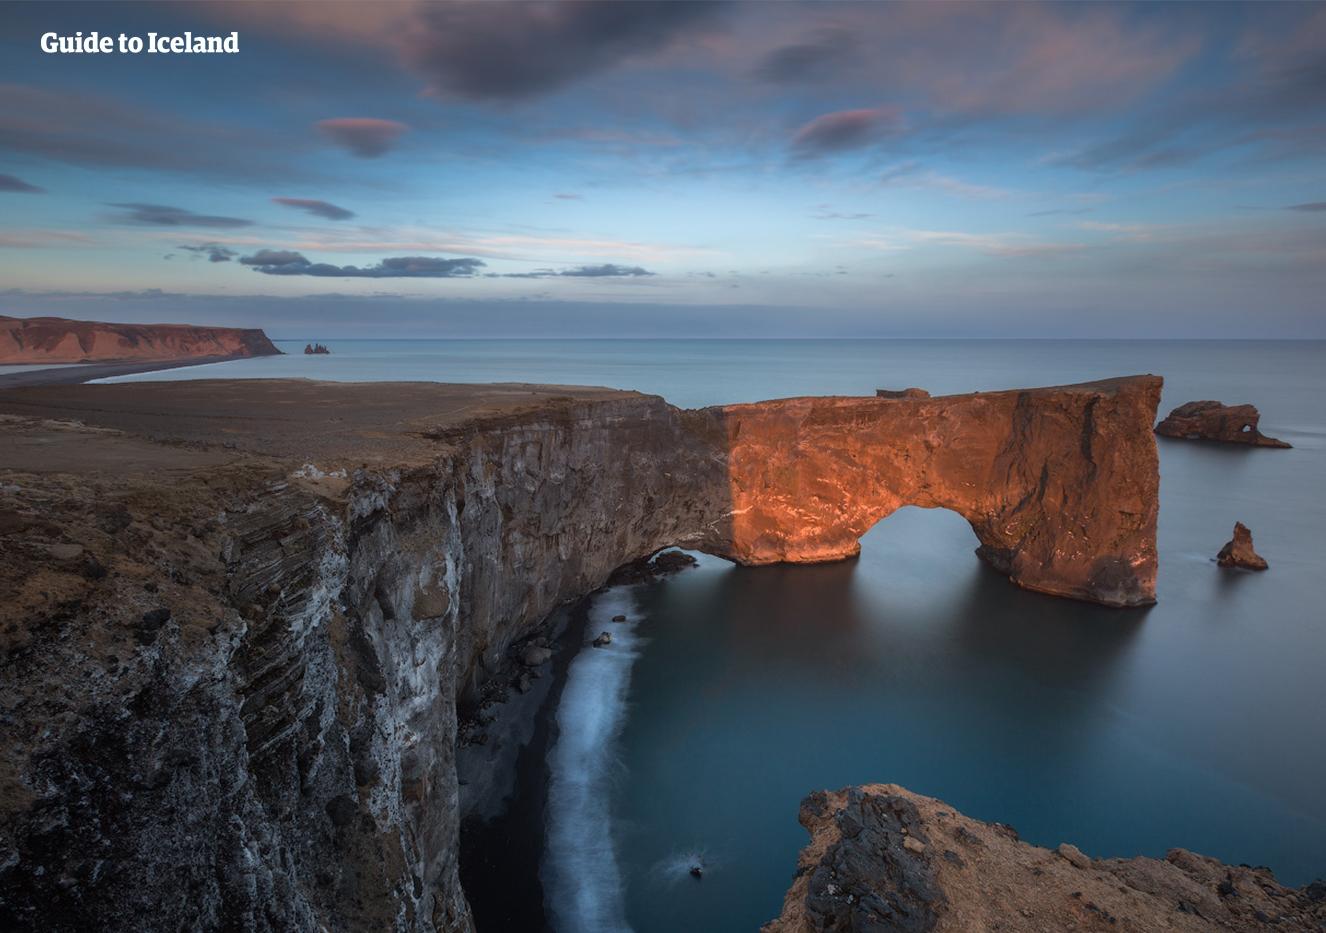 Het kleine schiereiland Dyrhólaey stond ooit bekend als 'Kaap Portland' onder langsreizende zeelieden.